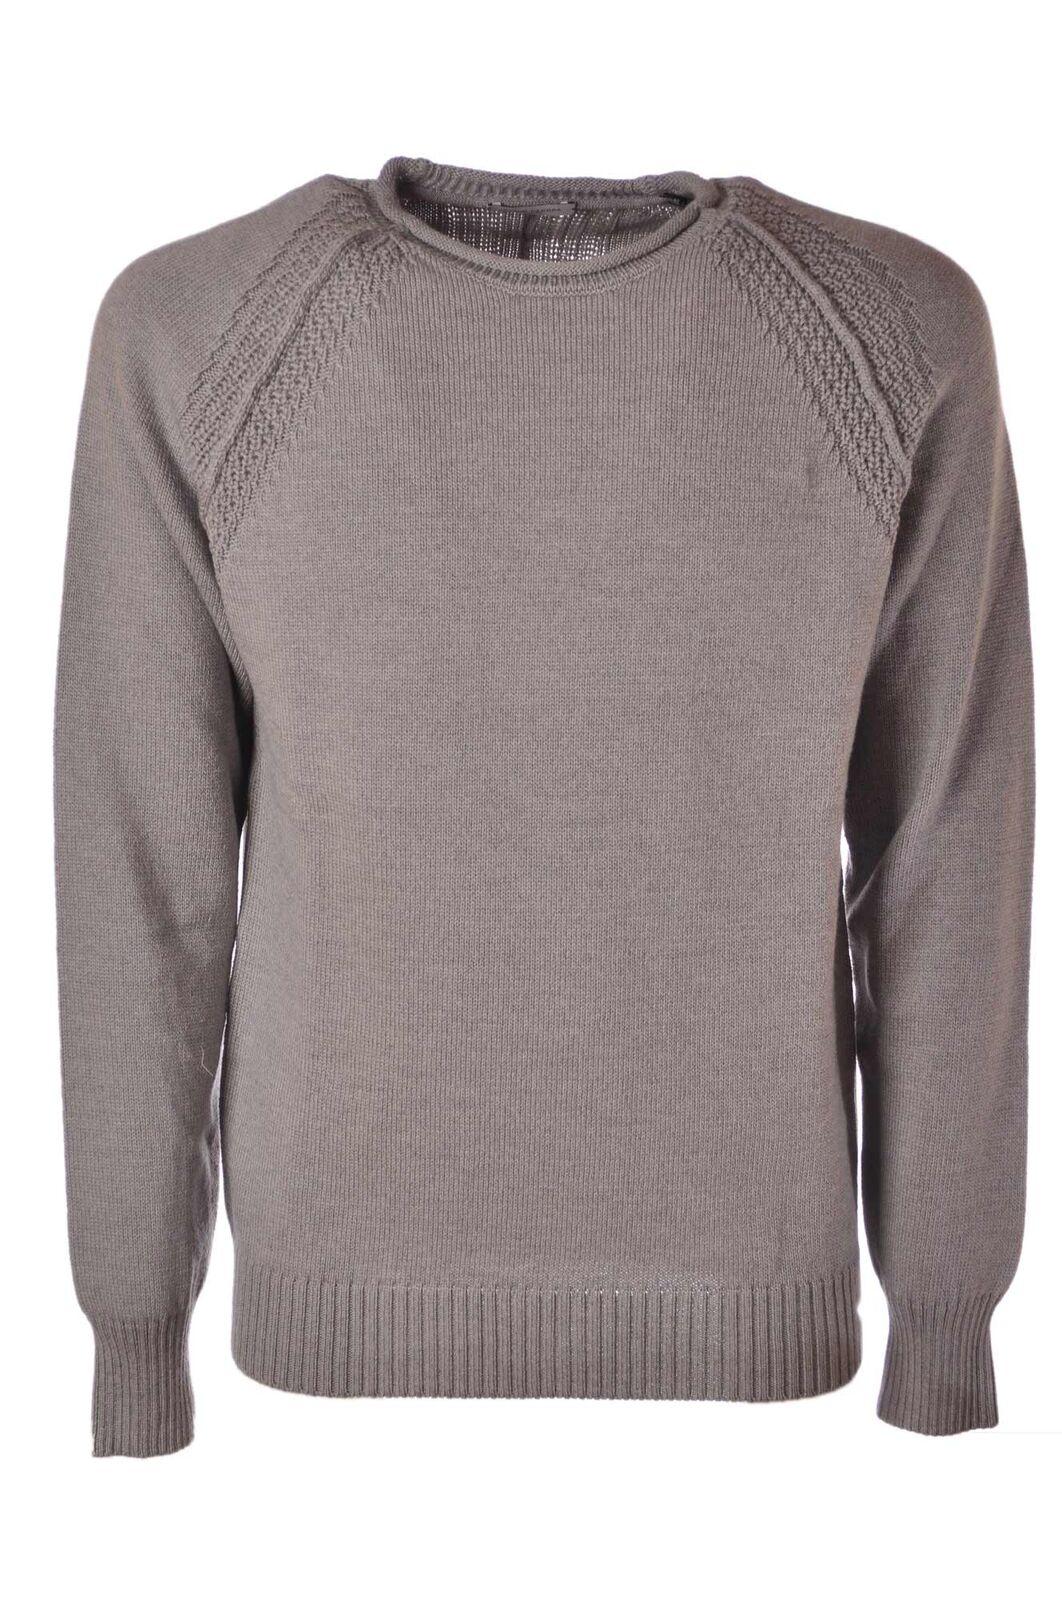 Paolo Pecora - Knitwear-Sweaters - Man - Grau - 4385304E181410